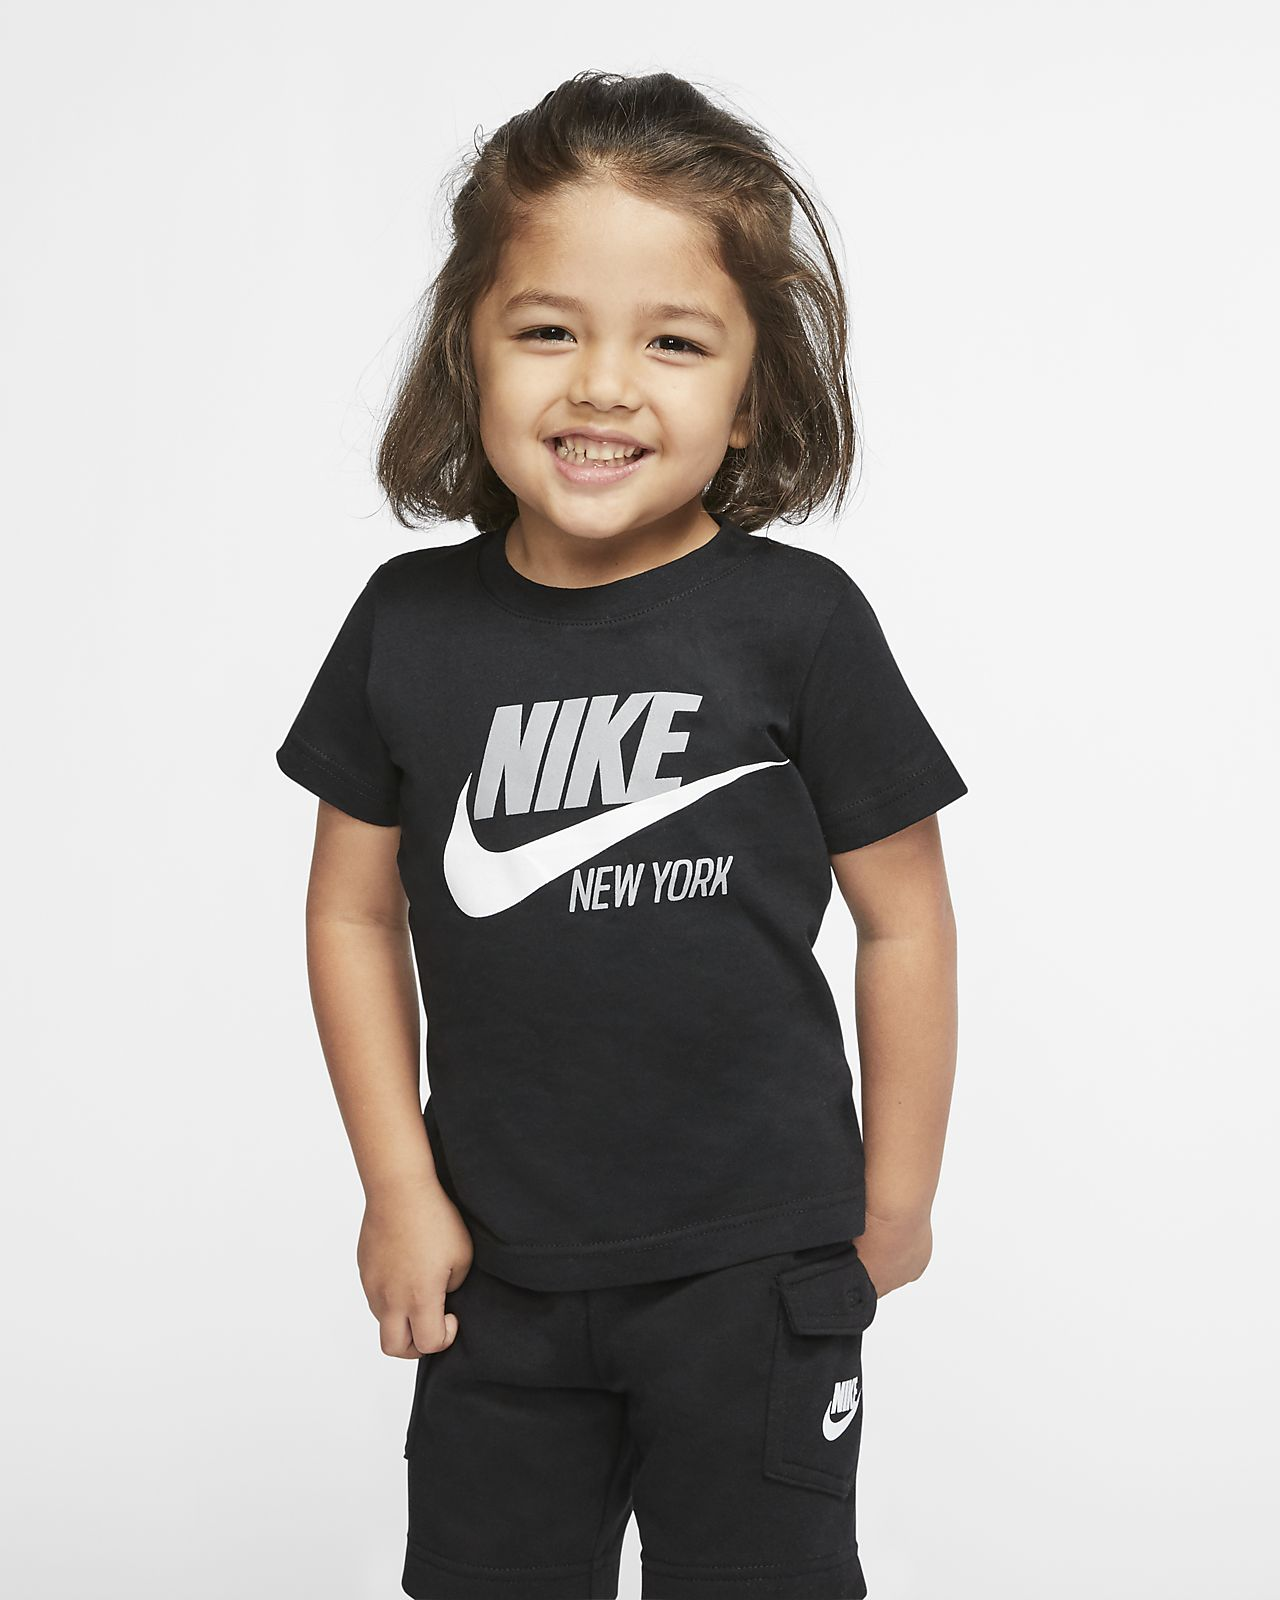 Nike Sportswear City Toddler Short-Sleeve T-Shirt